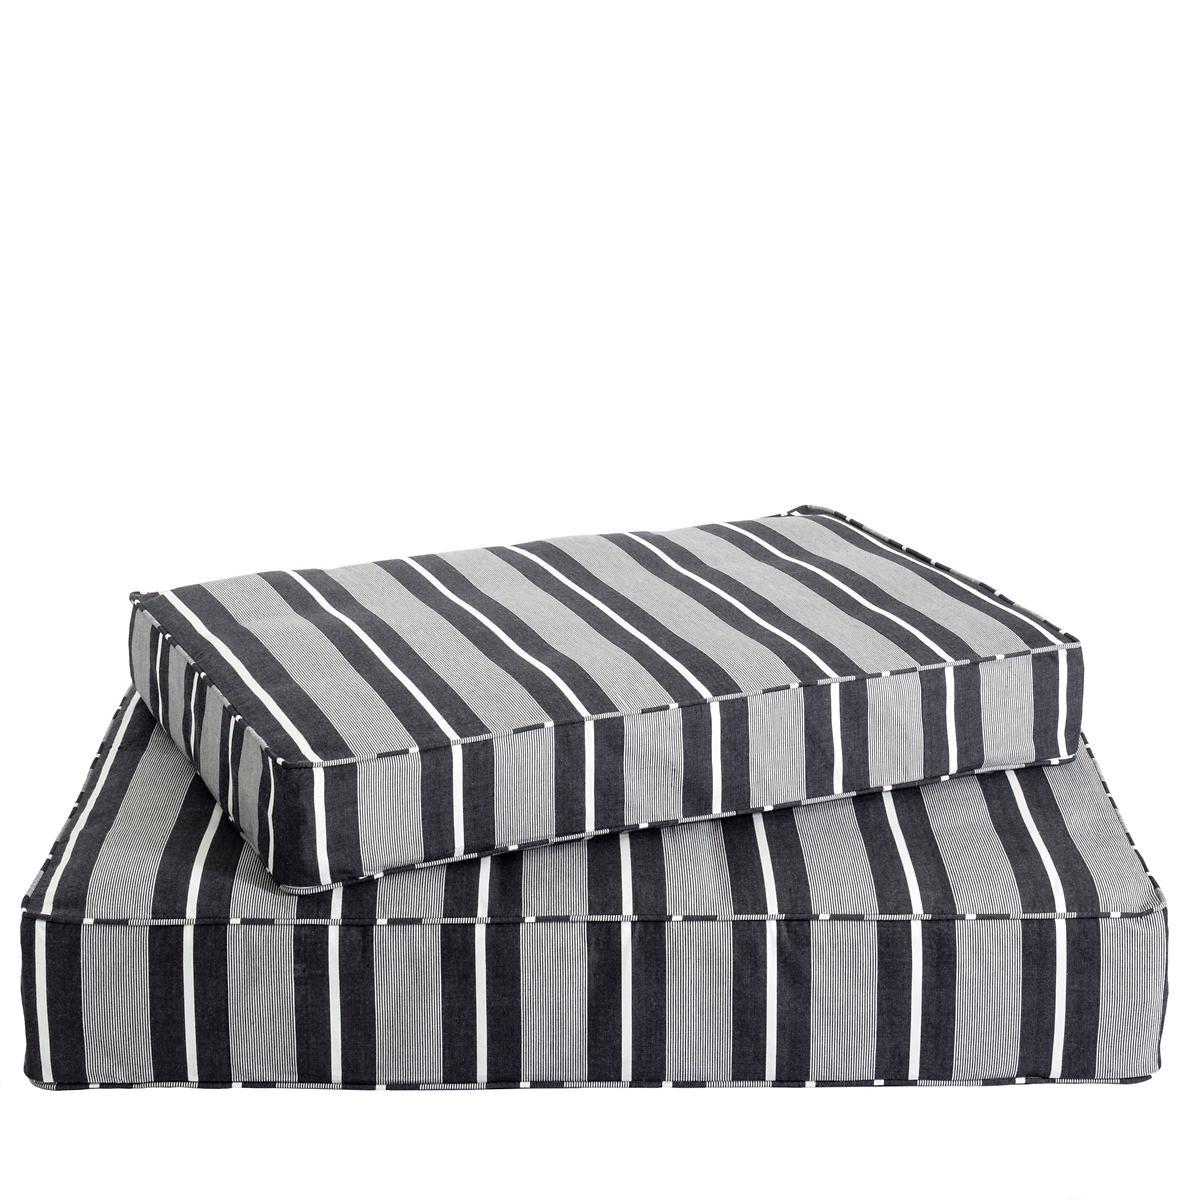 Berkeley Stripe Black Dog Bed Cover